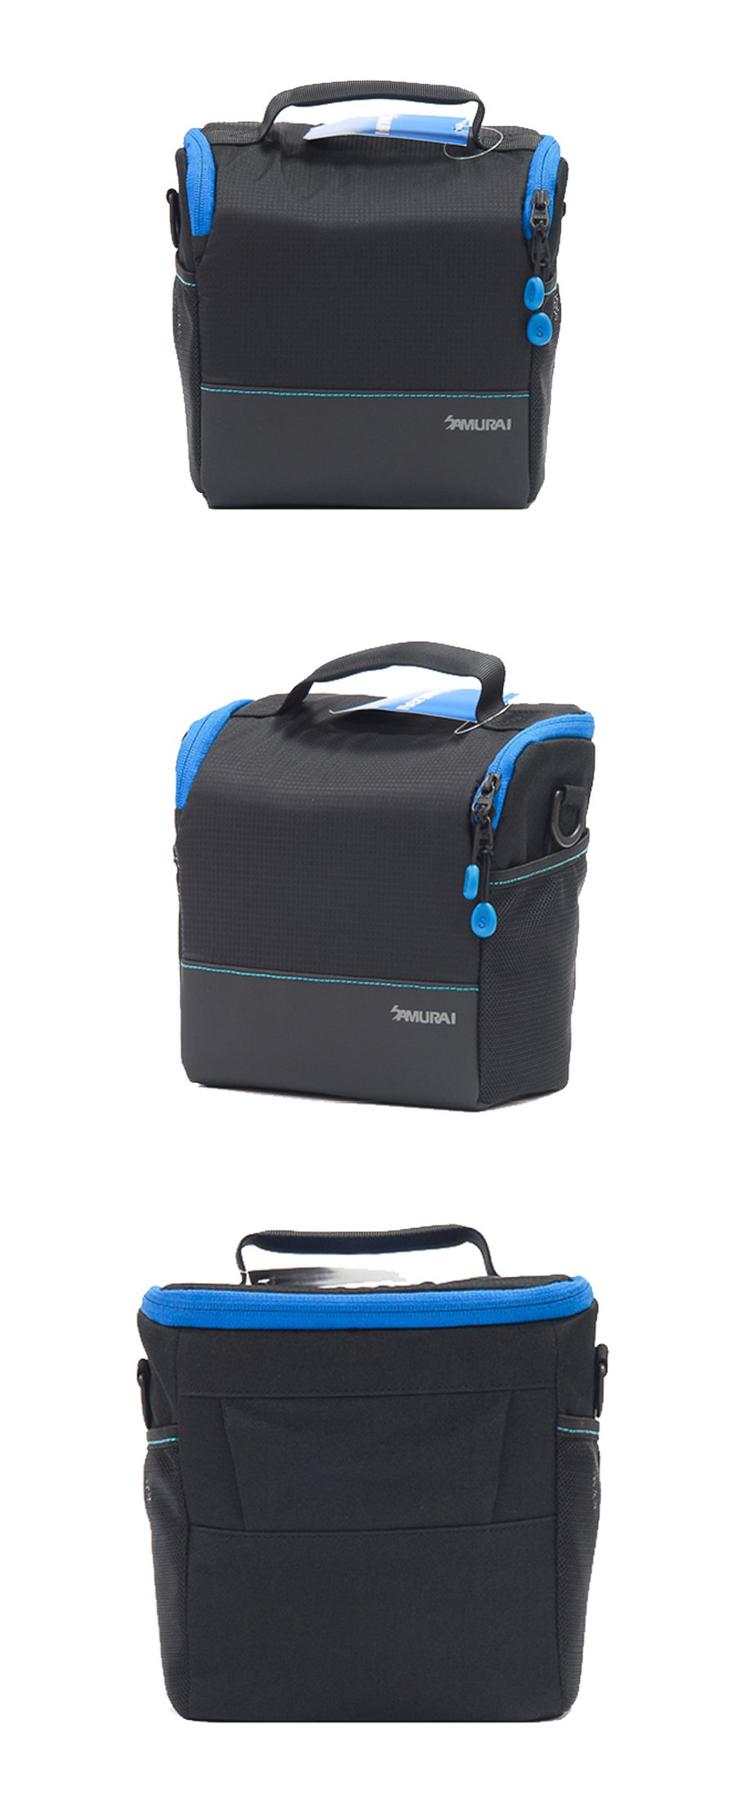 【EC數位】SAMURAI 新武士 S-CAM 01L 輕便旅遊手提相機包 一機二鏡 相機包 攝影收納袋 便攜包 攝影包